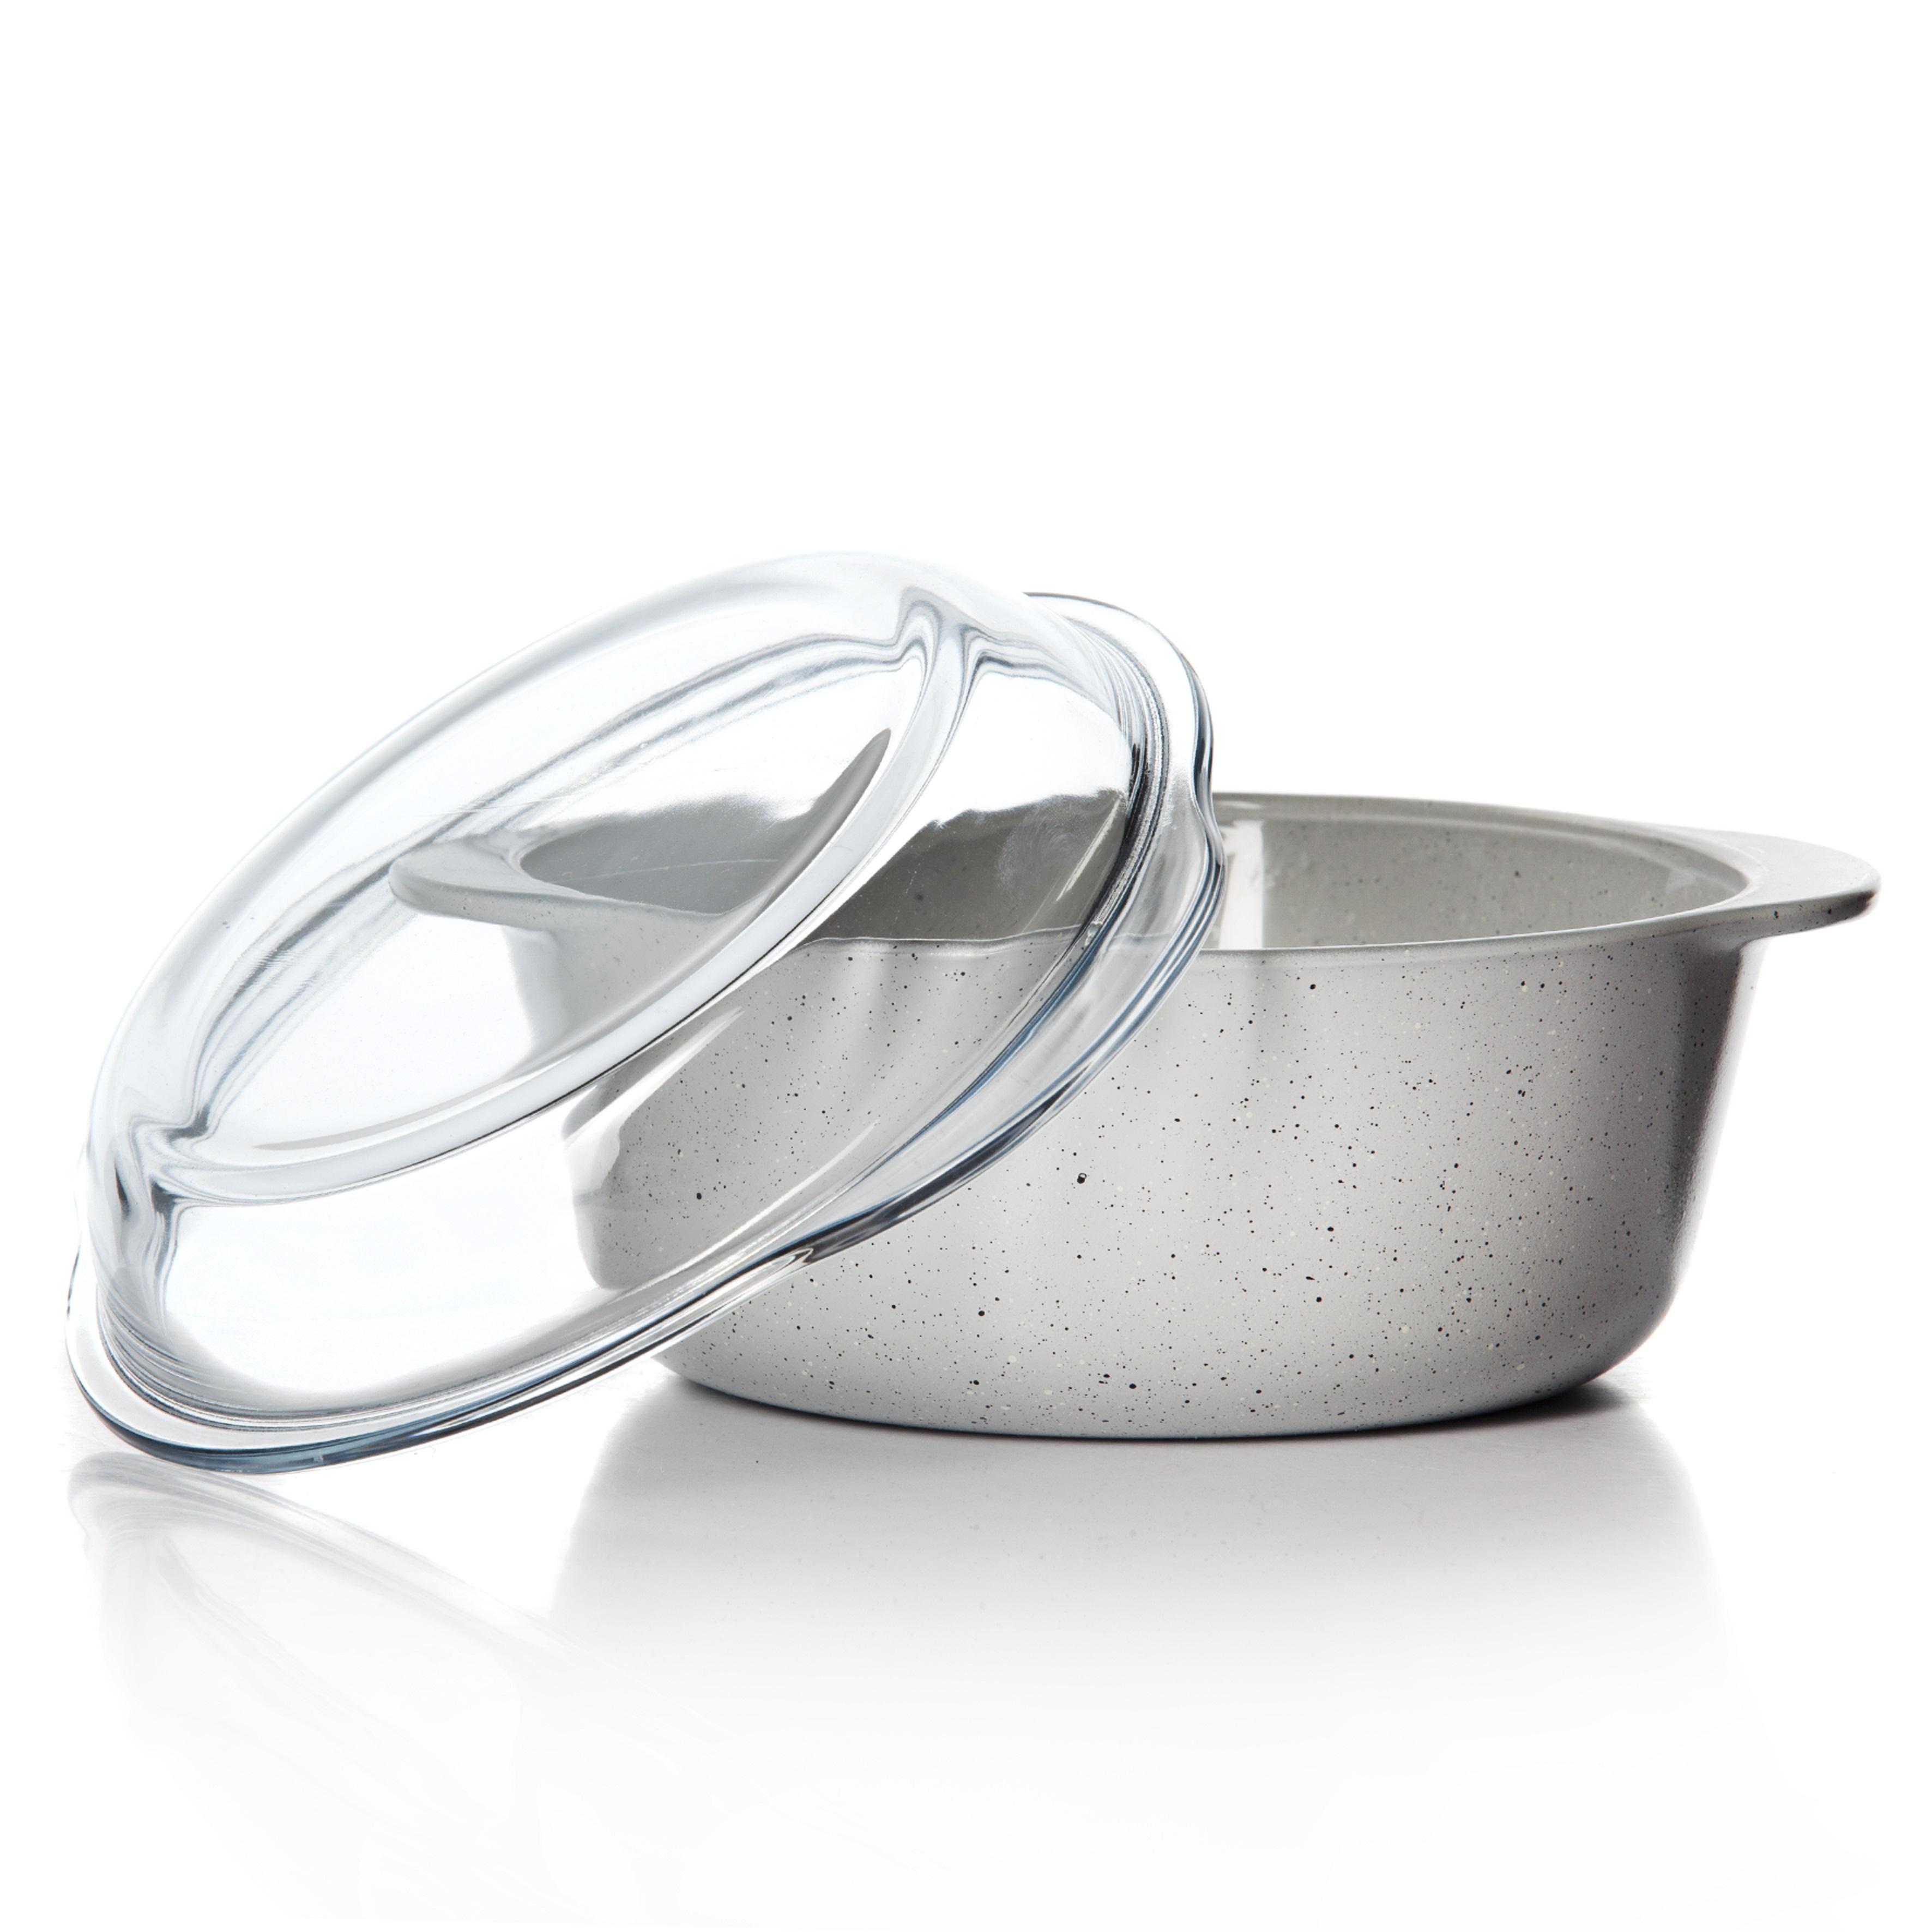 Посуда для СВЧ с крышкой 1450 мл.<br>